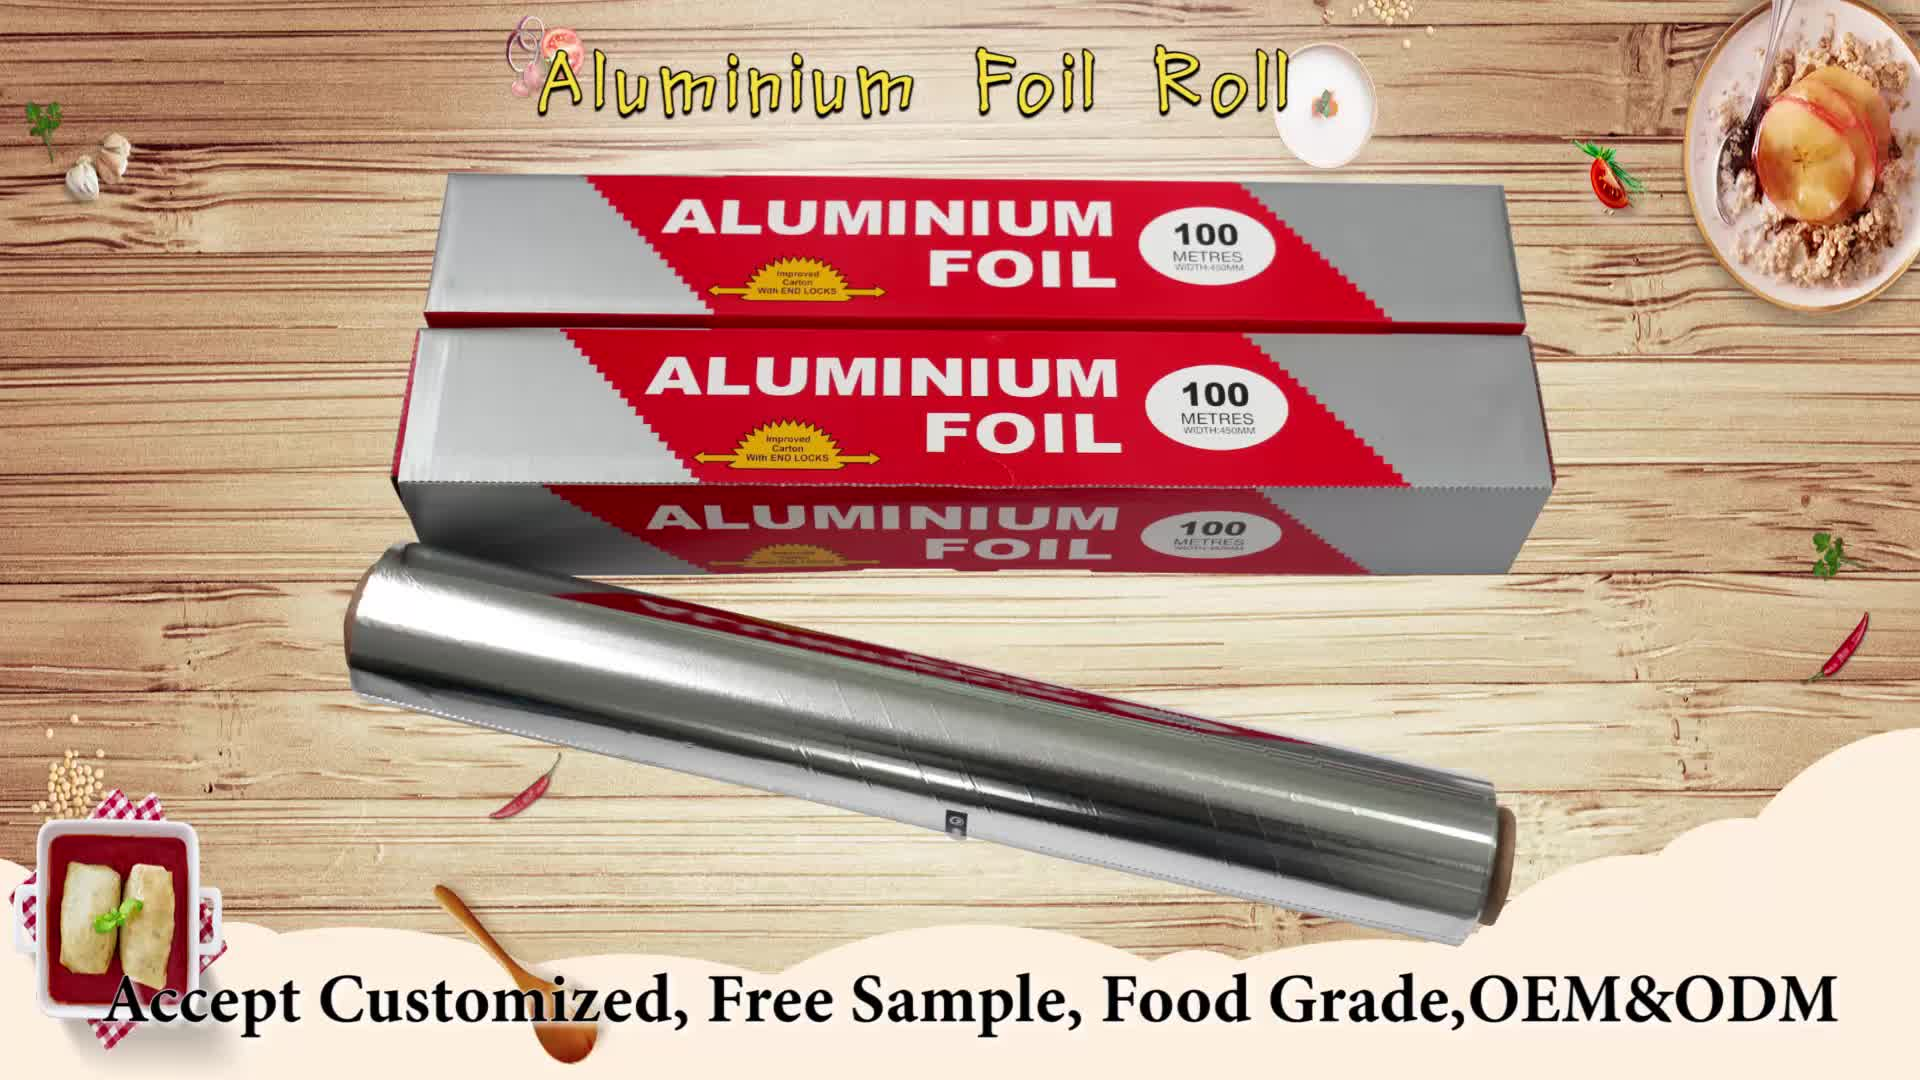 एल्यूमीनियम folie पैकिंग पेपर रोल के लिए फास्ट फूड (एसजीएस, एफडीए, Tuv प्रमाणपत्र)